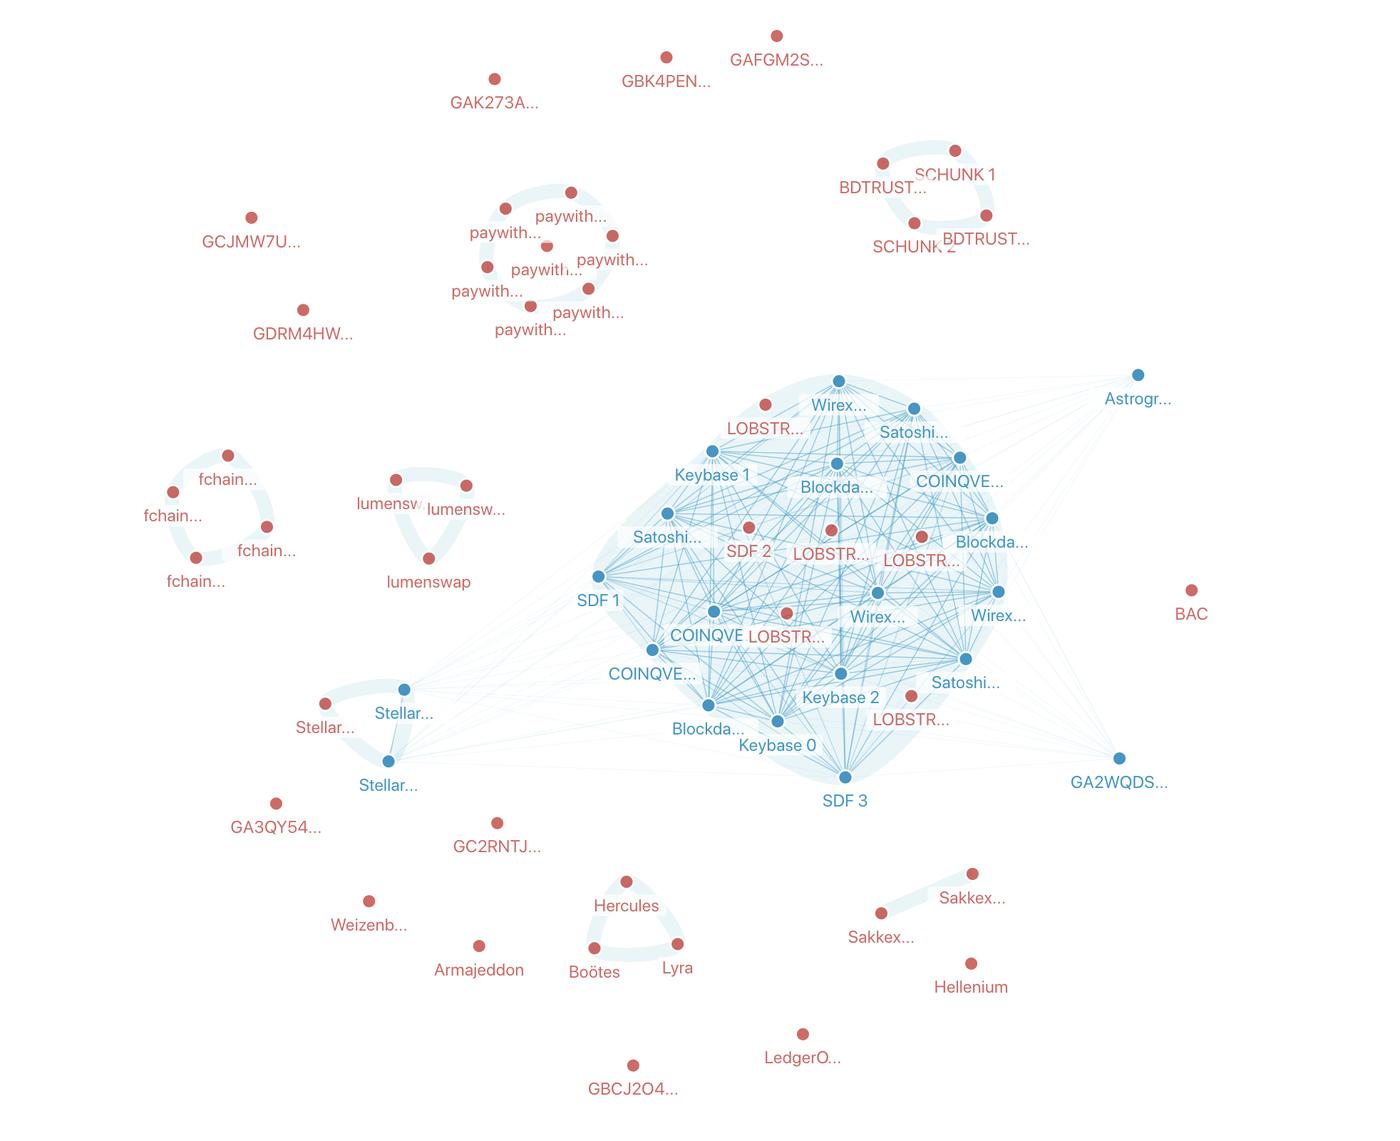 Validator nodes in the Stellar network